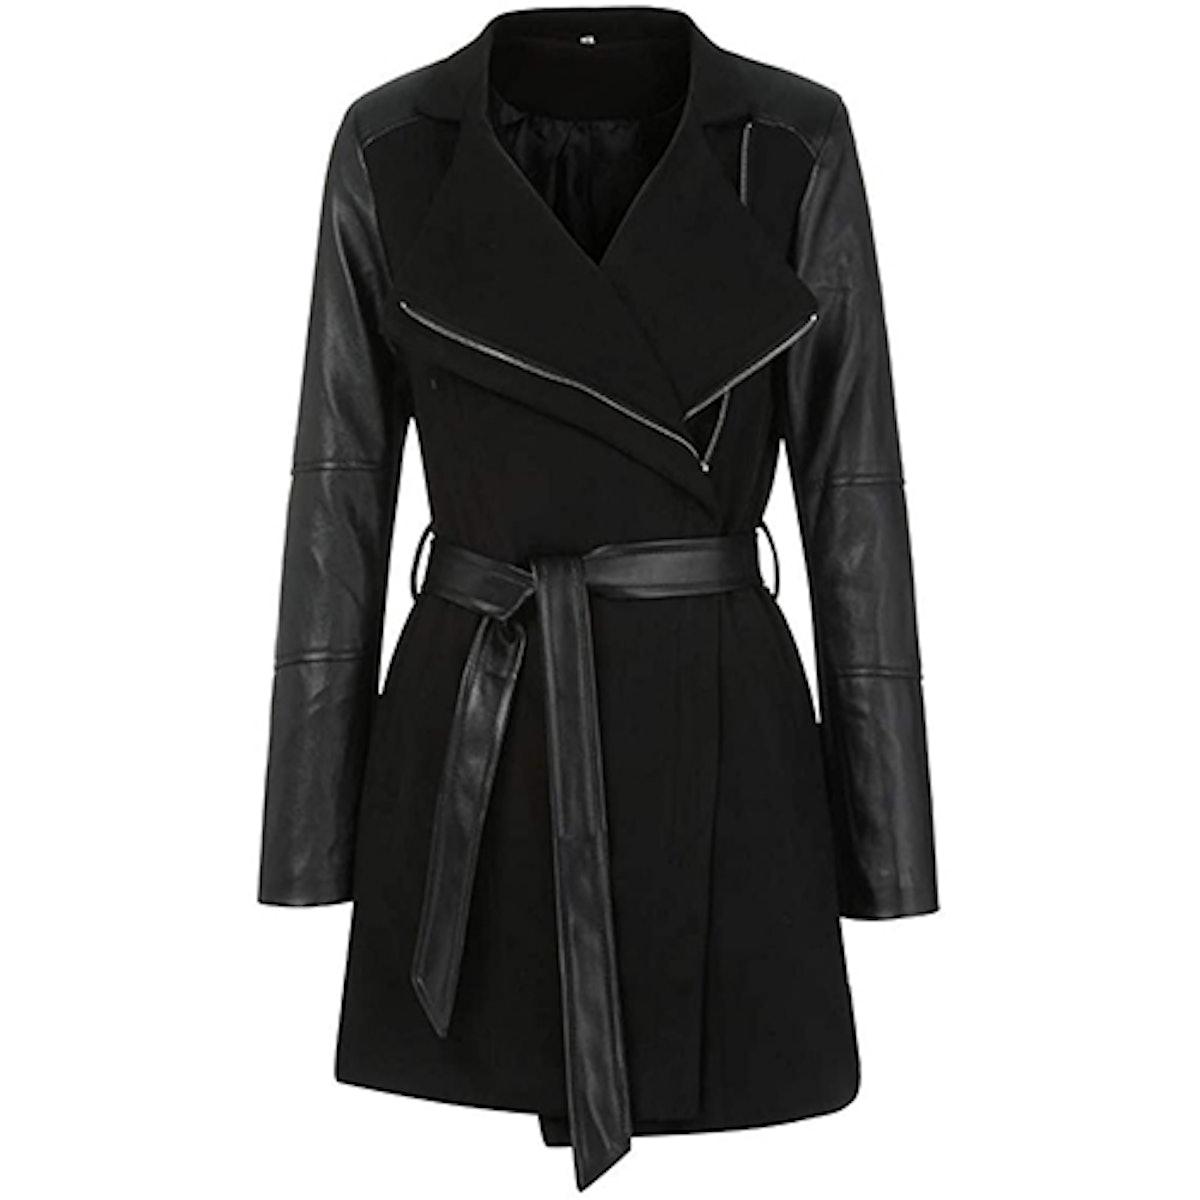 LISTHA Long Leather Woolen Overcoat